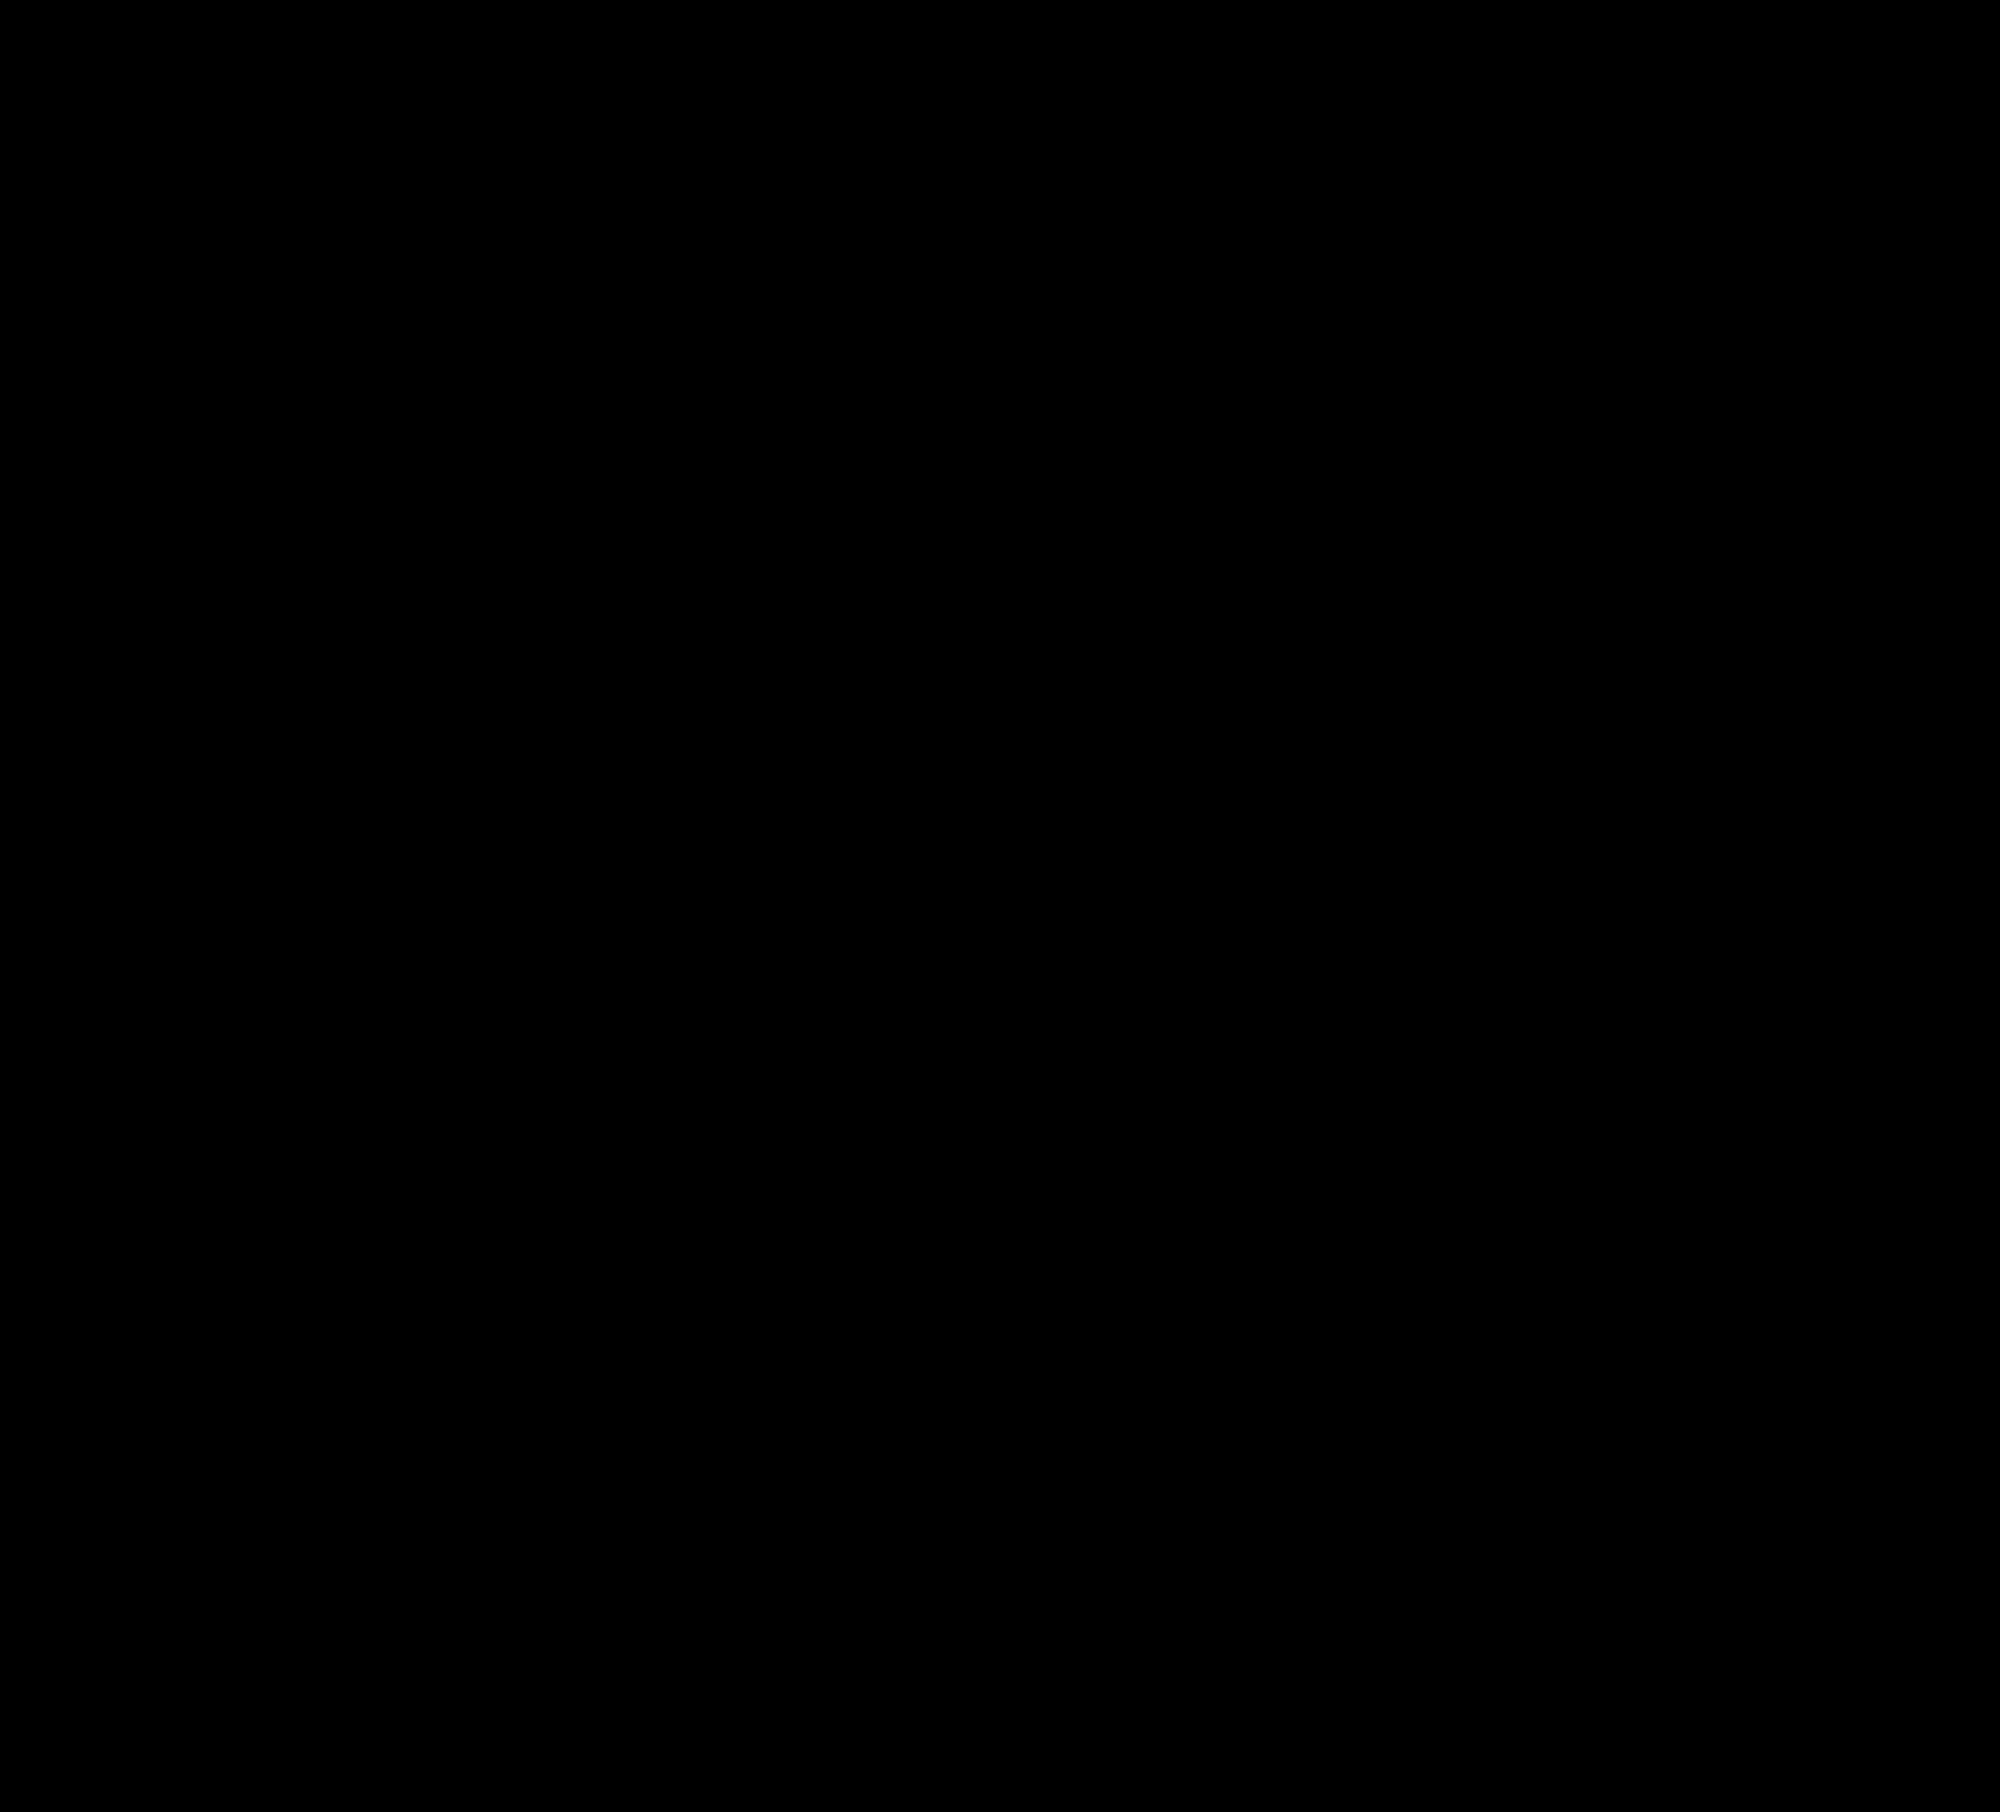 The four symbols lz google search led zeppelin pinterest the four symbols used on led zeppelin iv album jimmy page john paul jones john bonham and robert plant my favorite four symbols from my four favorite biocorpaavc